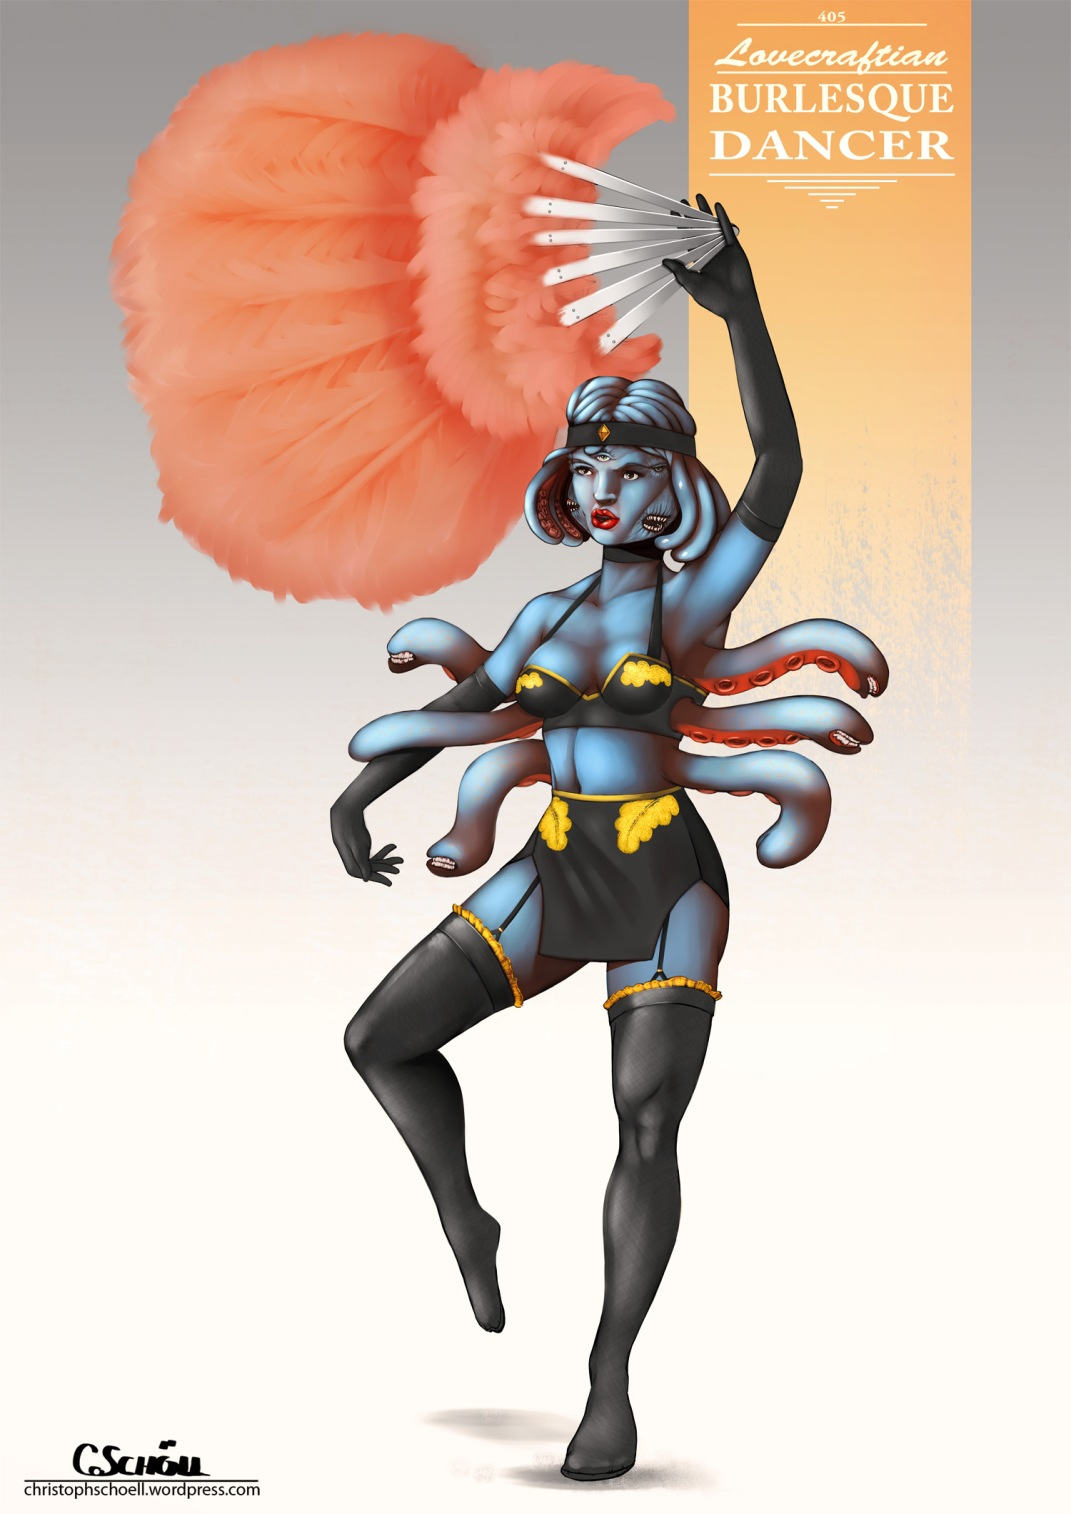 CHOW405_Lovecraftian_Burlesque_Dancer